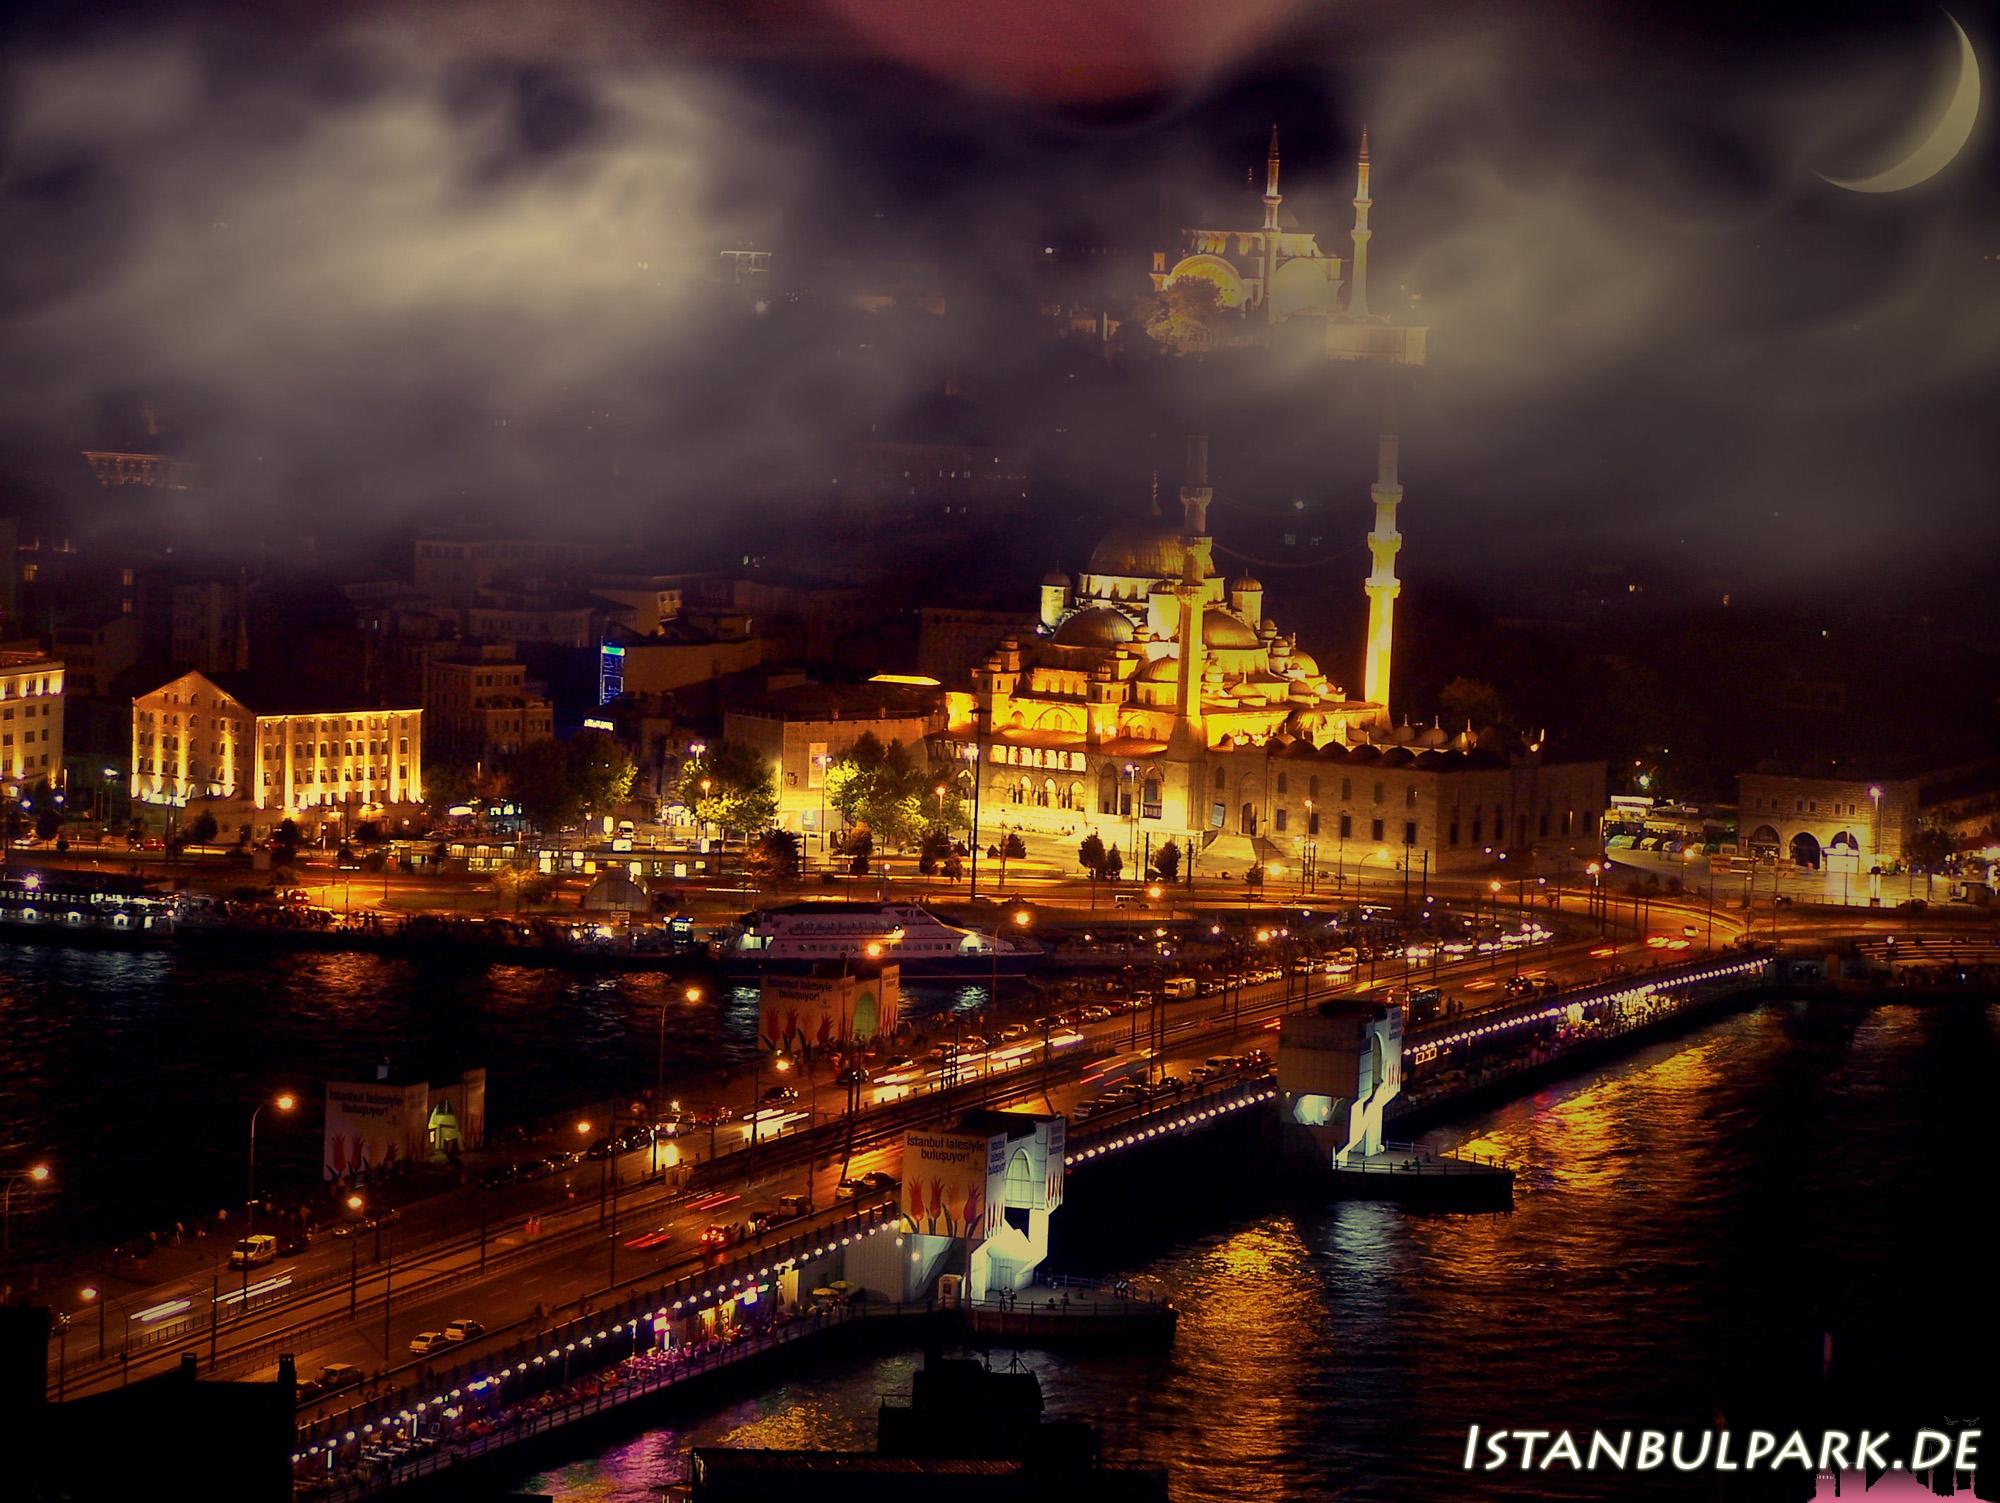 Istanbul Beauty Place - Istanbul Beauty Place